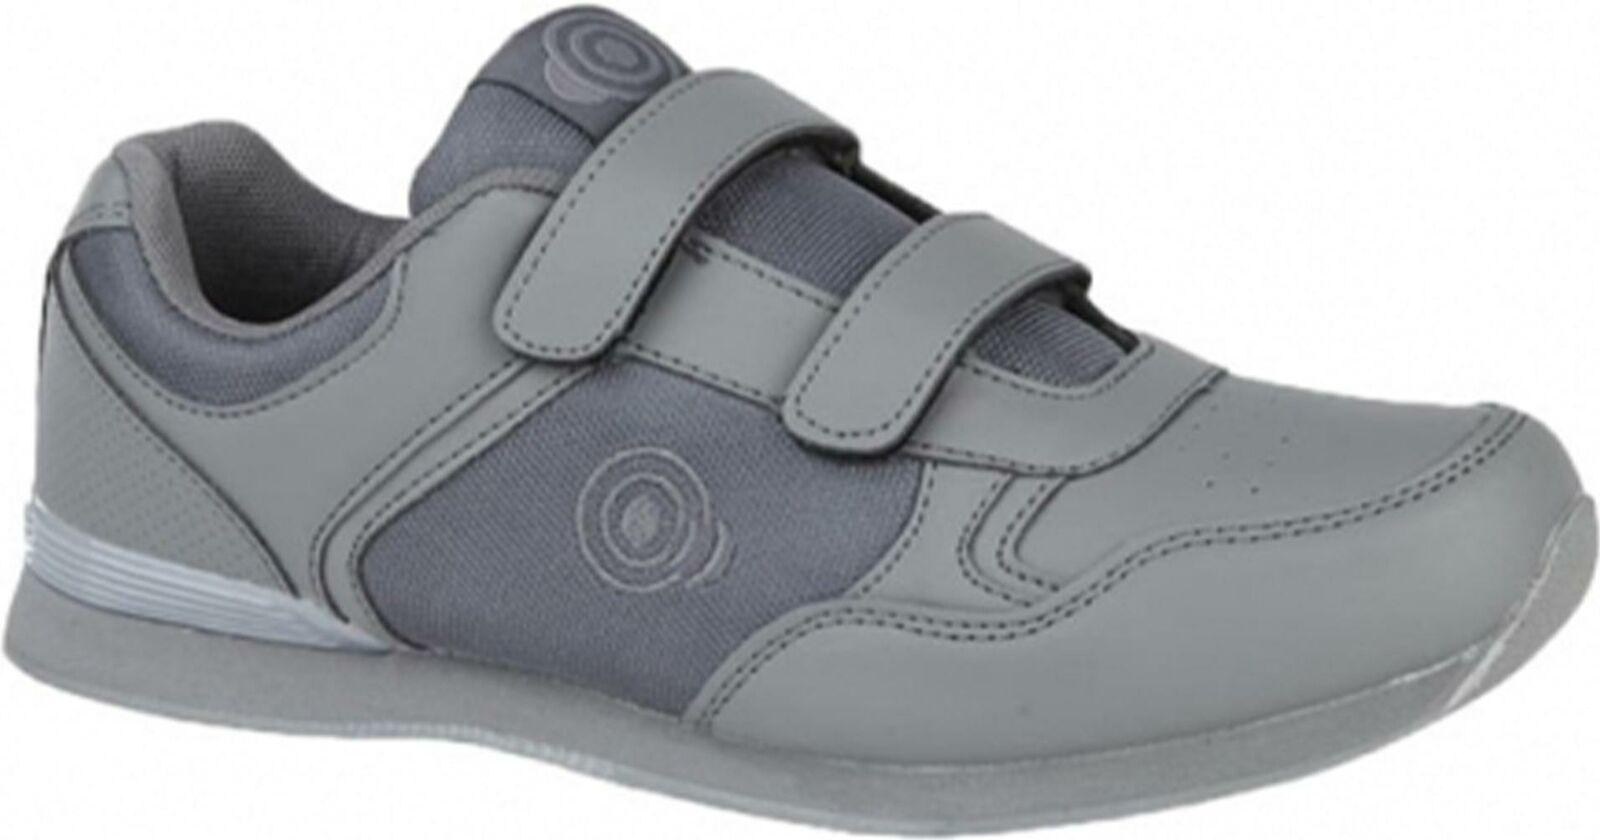 DEK DRIVE Mens Flexible EVA Touch Fasten Casual Dress Sports Trainers Grey